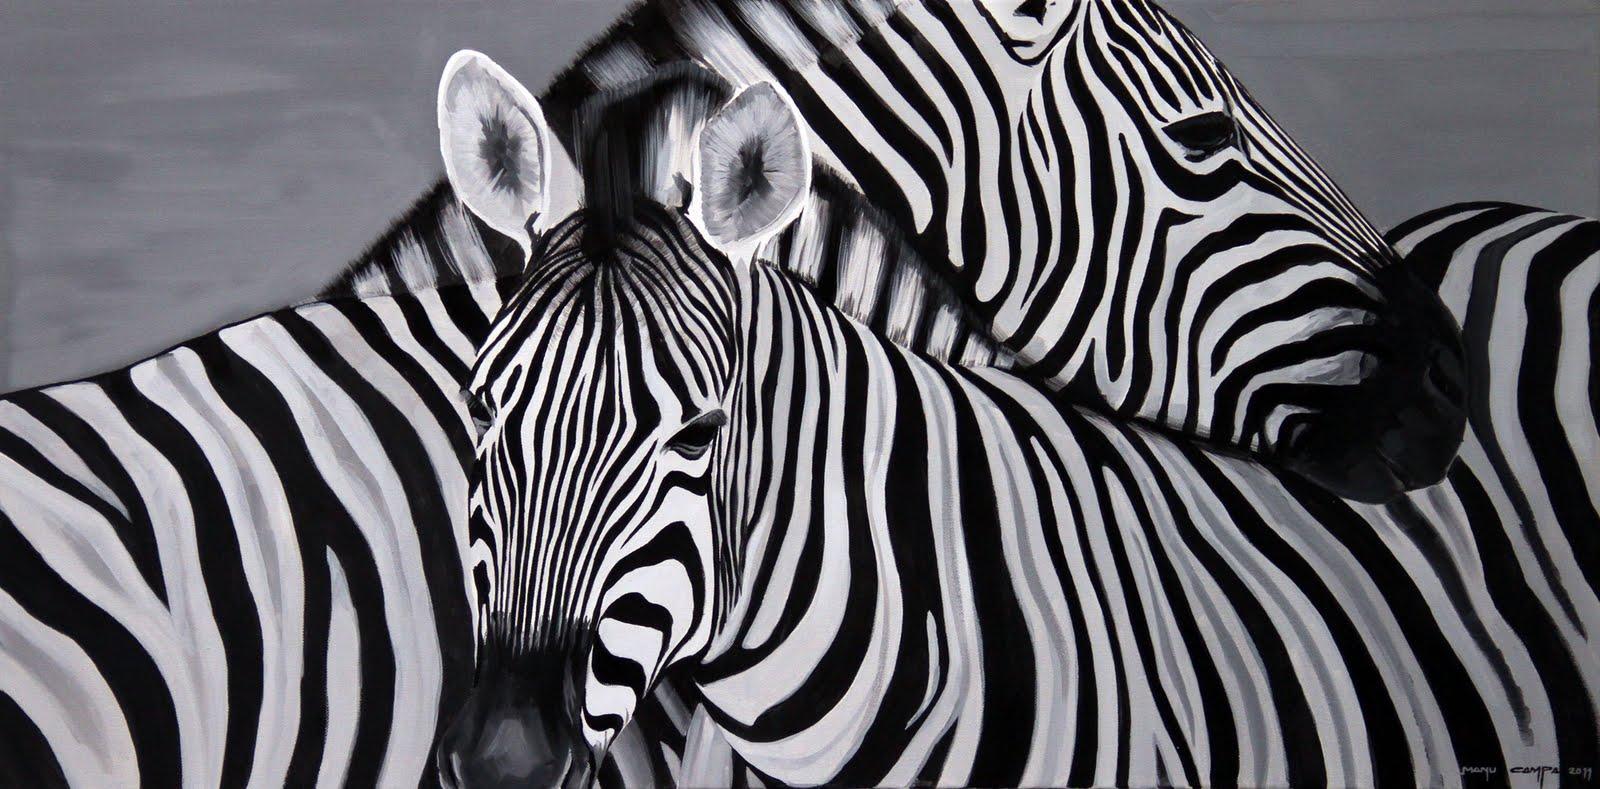 Retrato de cebras cebras pinterest - Cuadros de cebras ...